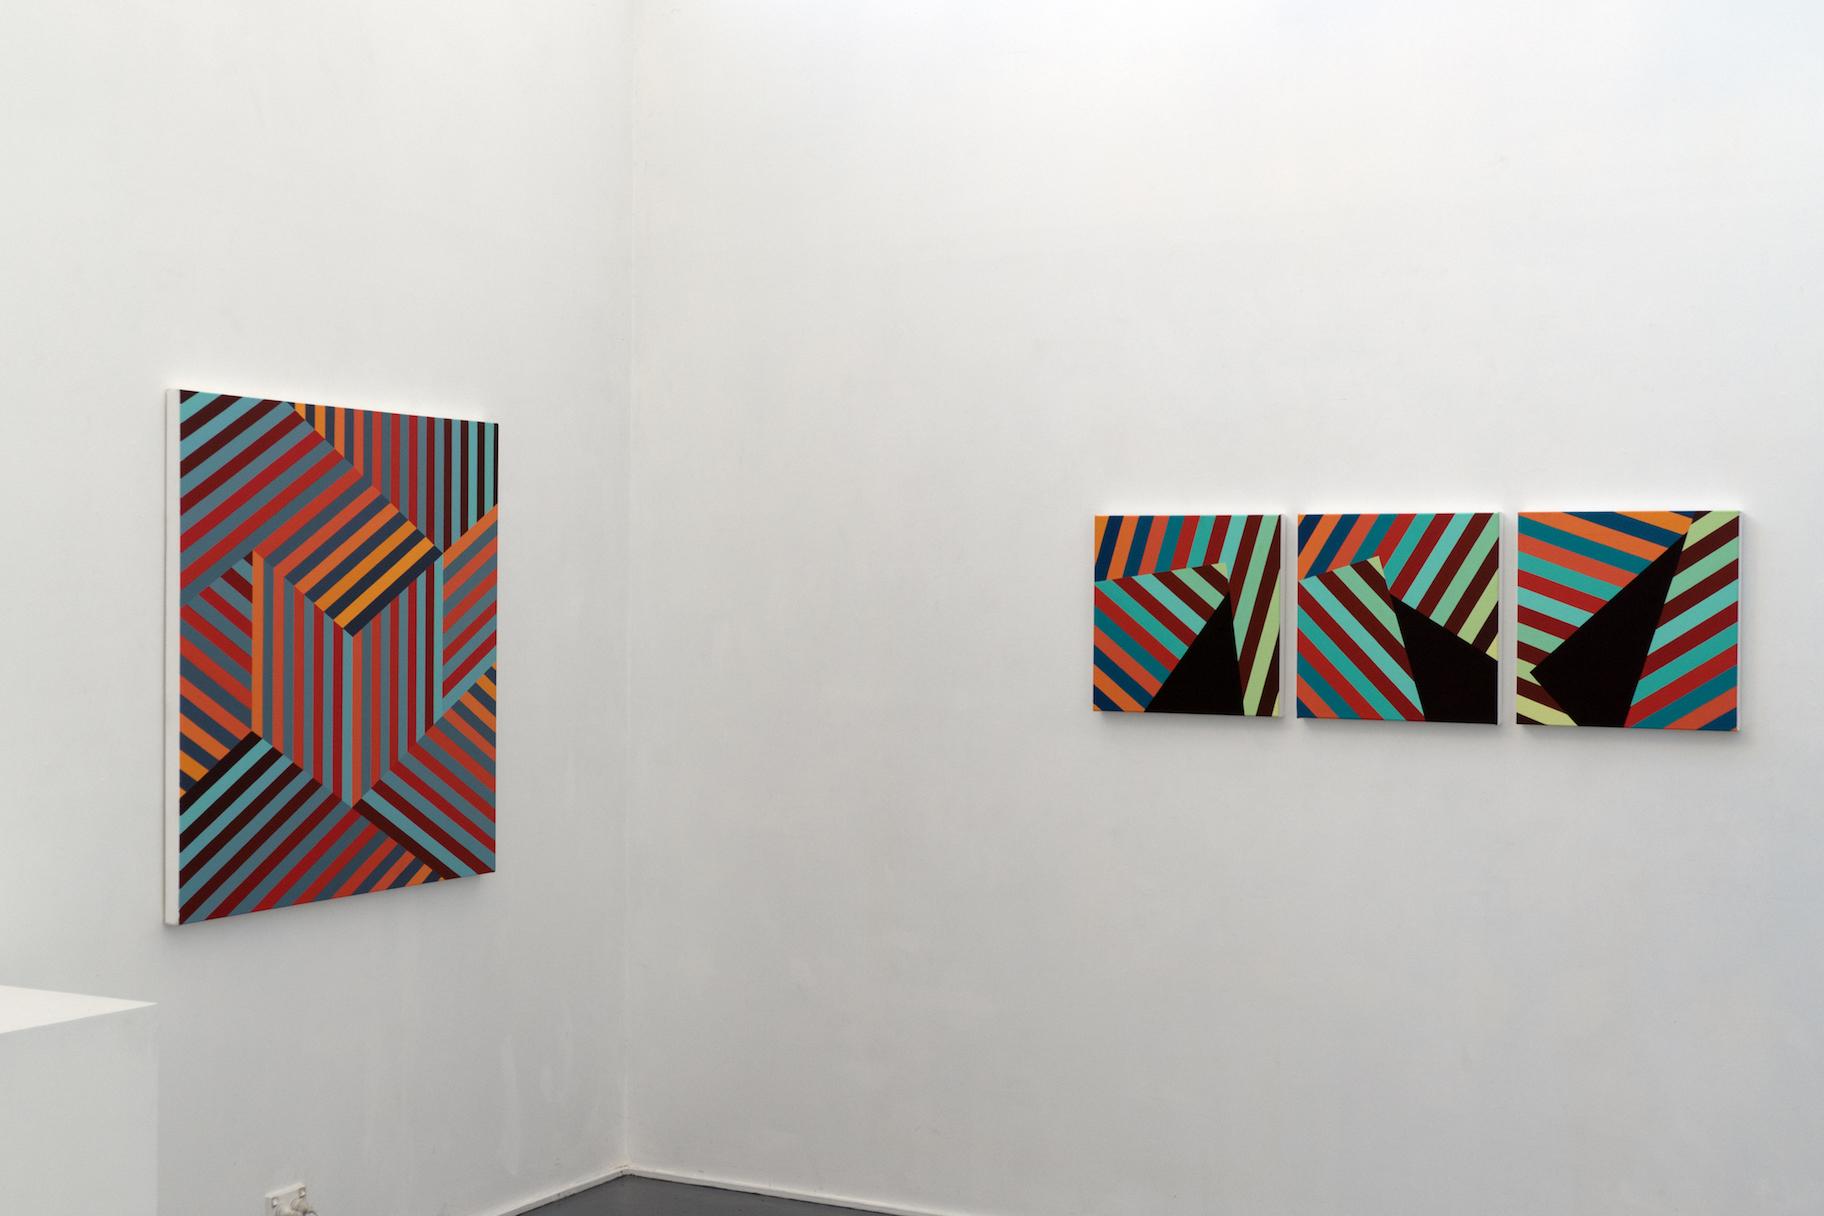 Tom Loveday, Edge of Reality, 2018, Installation